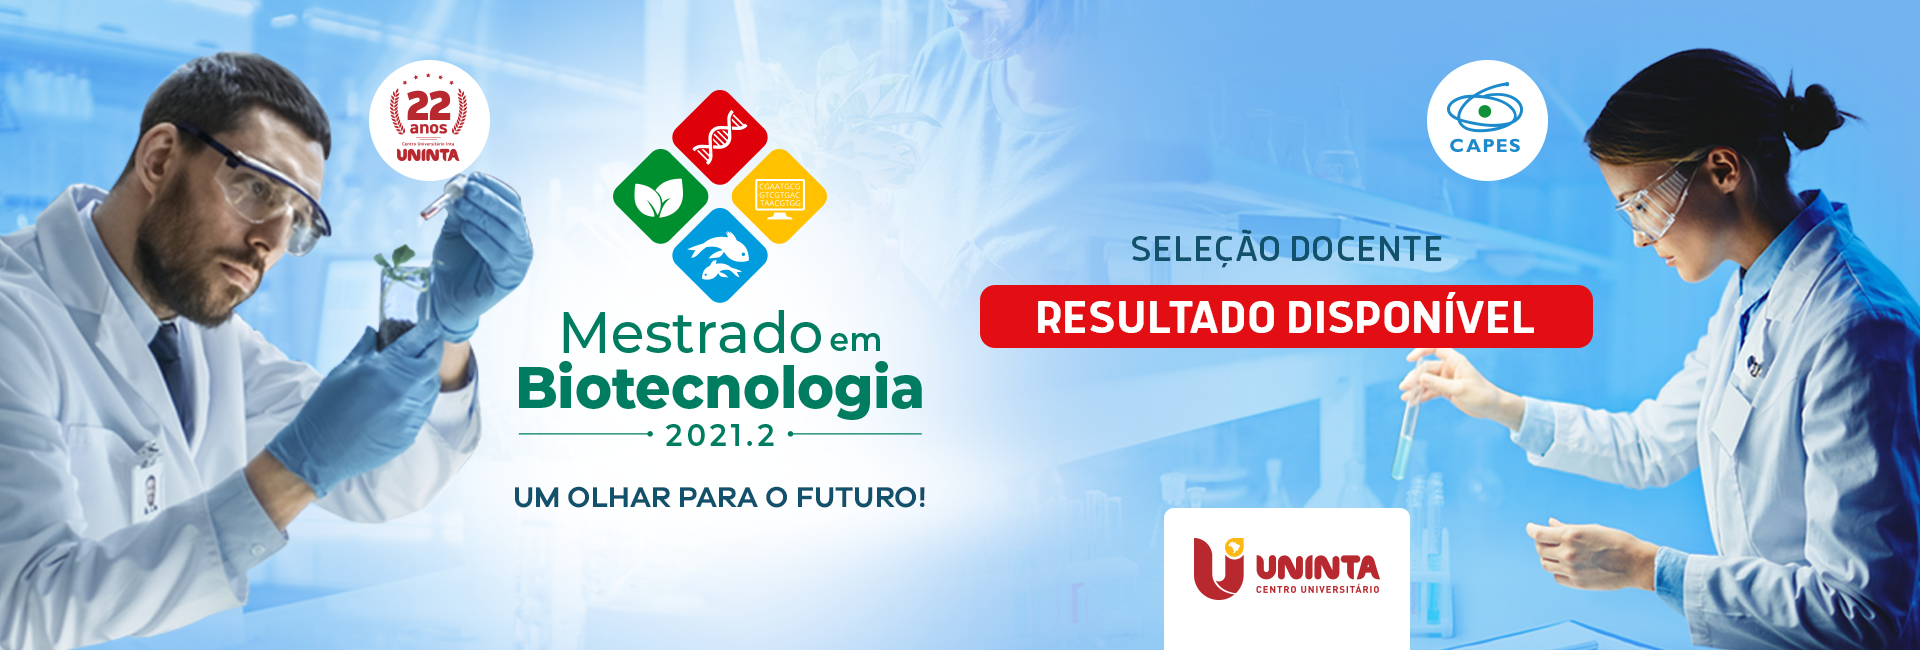 Mestrado-em-Biotecnologia-2021-2-IIBanner-Home-III